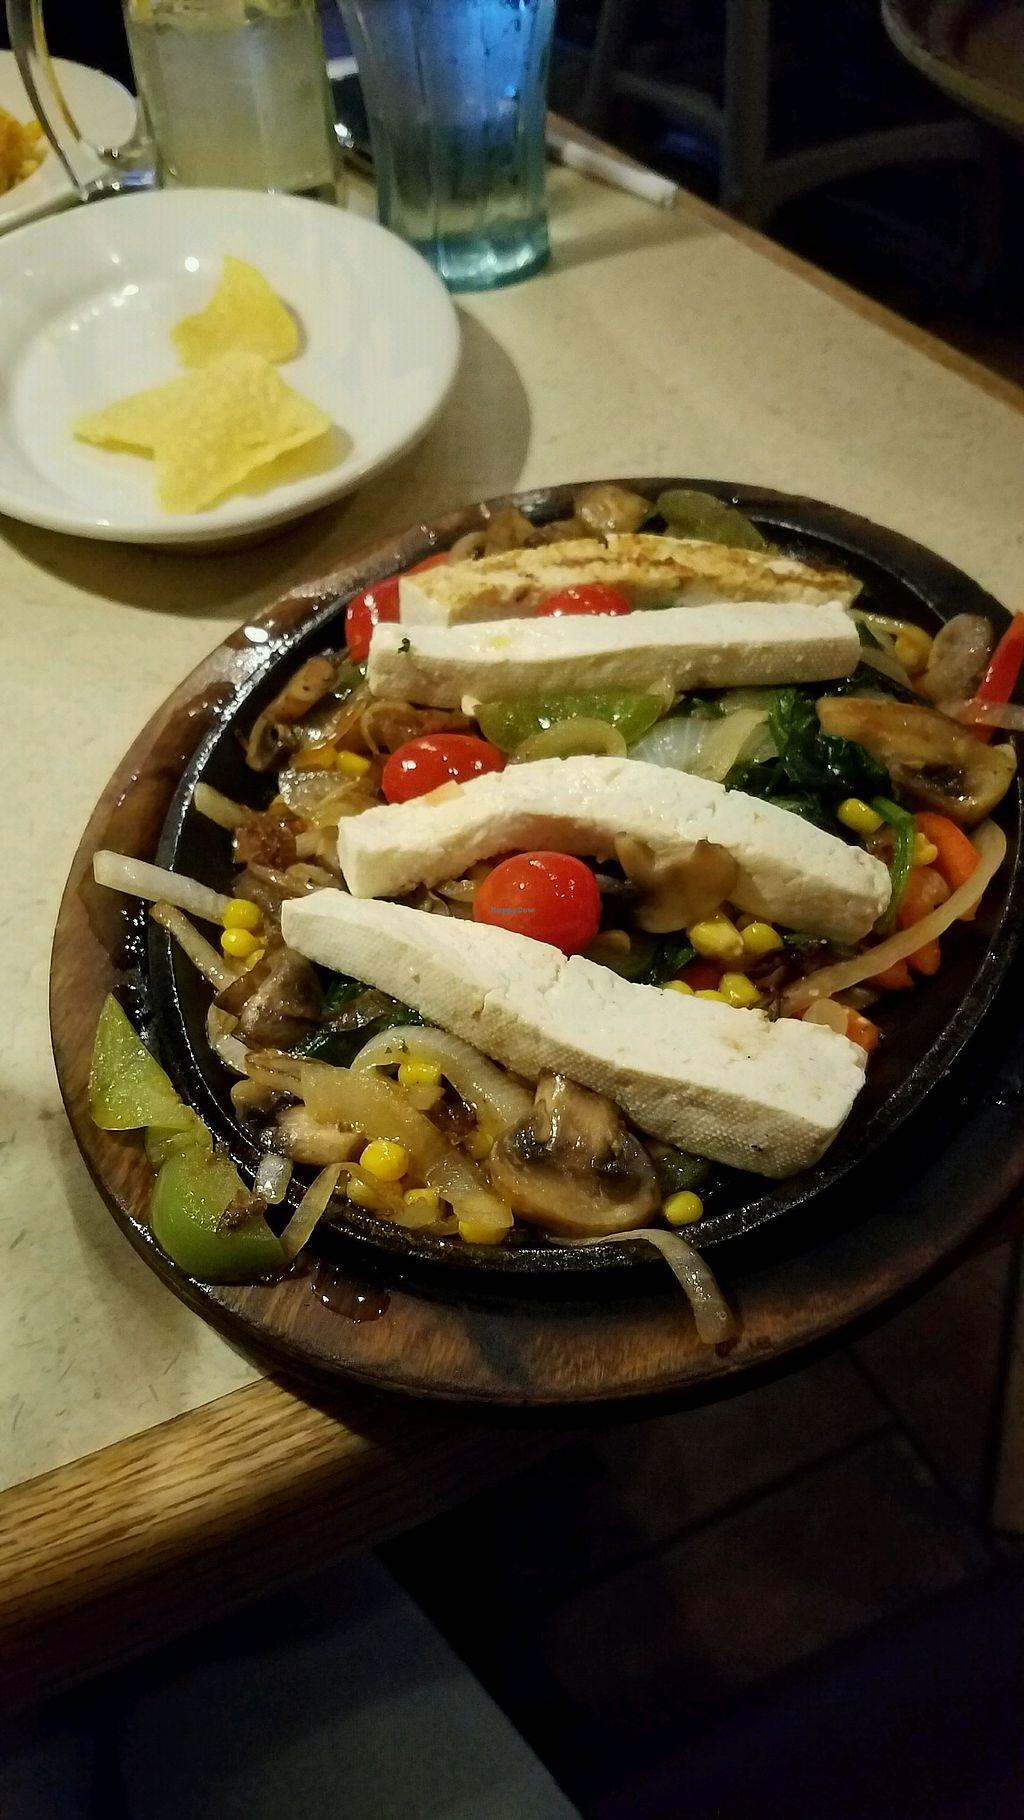 "Photo of La Parrilla Mexican Restaurant  by <a href=""/members/profile/rachelgirl8"">rachelgirl8</a> <br/>tofu fajitas <br/> March 30, 2018  - <a href='/contact/abuse/image/115744/378496'>Report</a>"